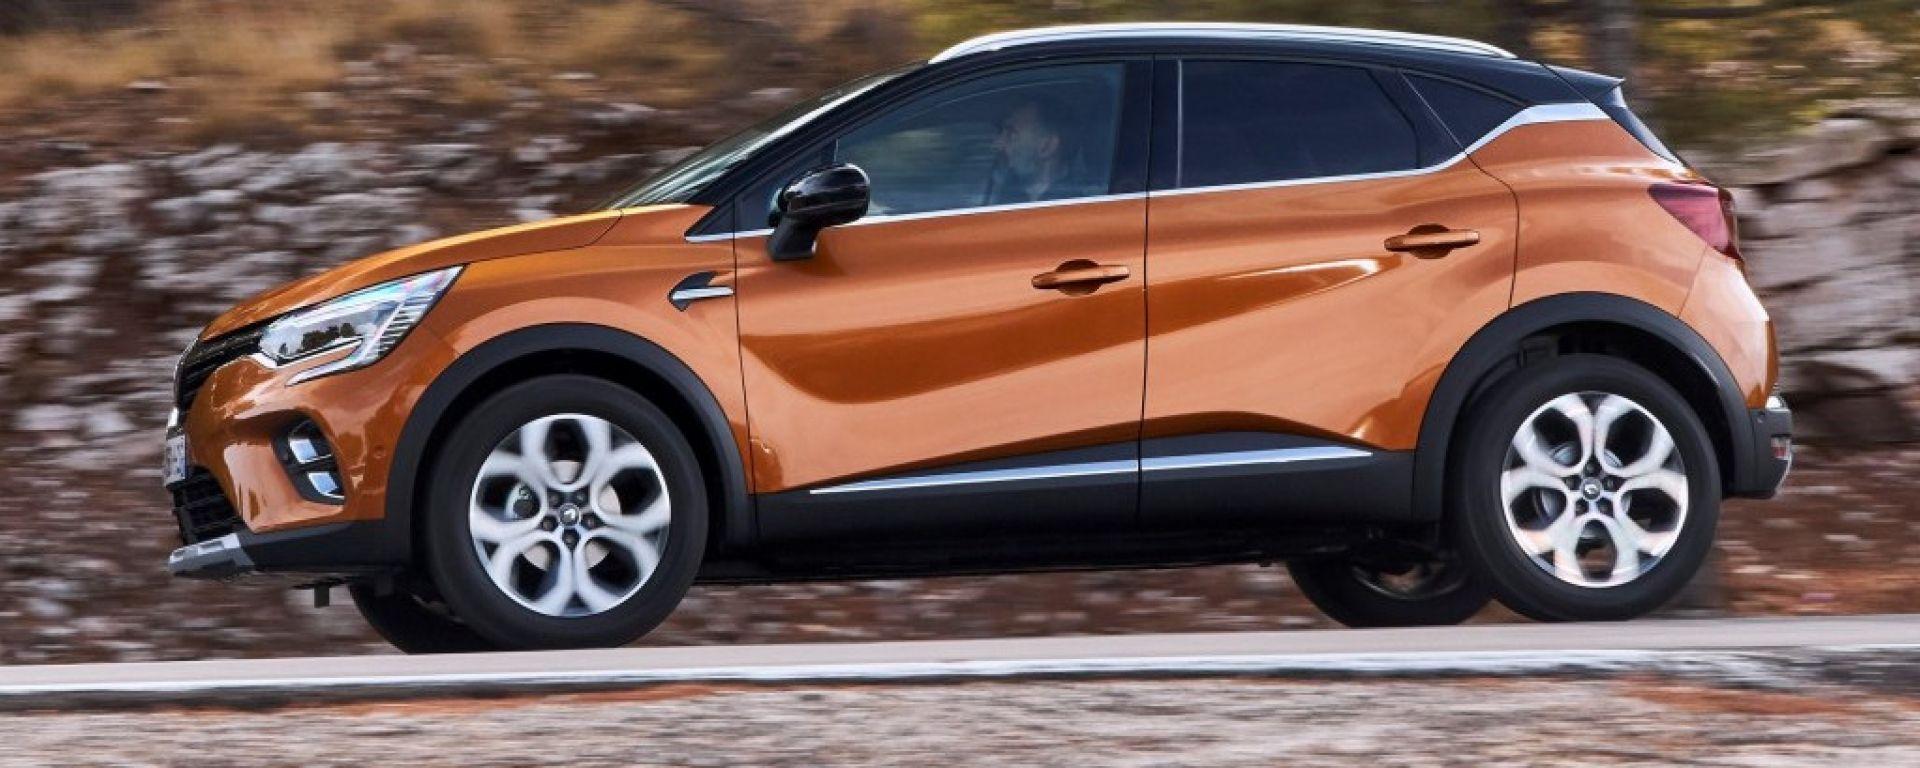 Nuovo Renault Captur, vista laterale